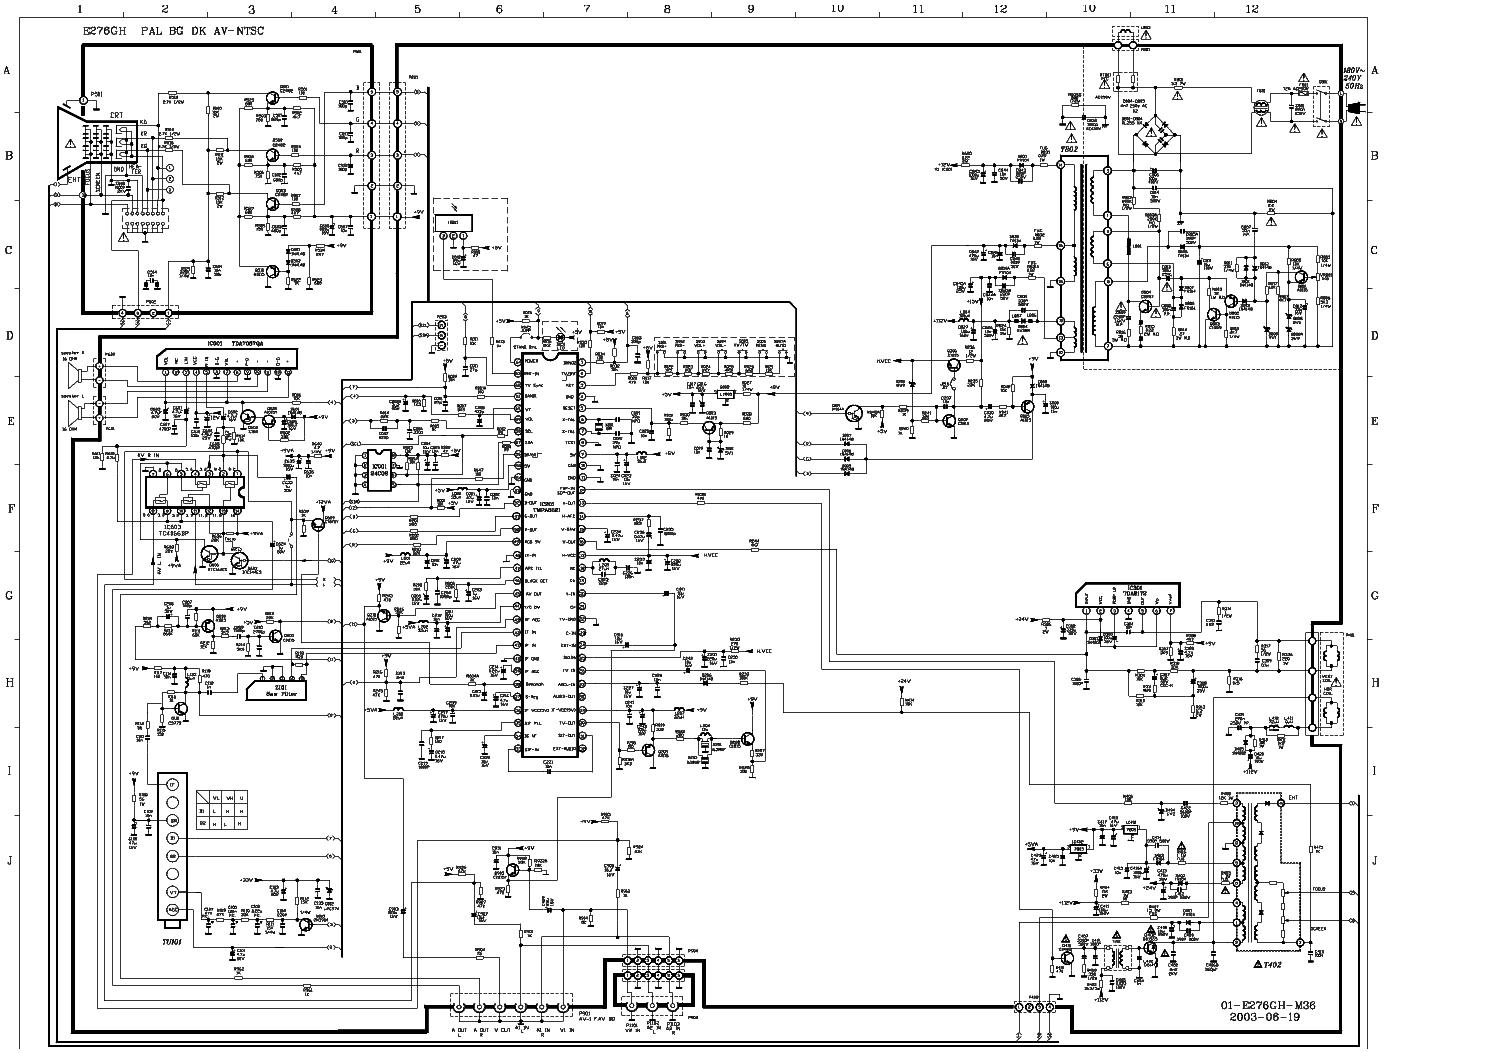 TCL E276GH SCH Service Manual download, schematics, eeprom